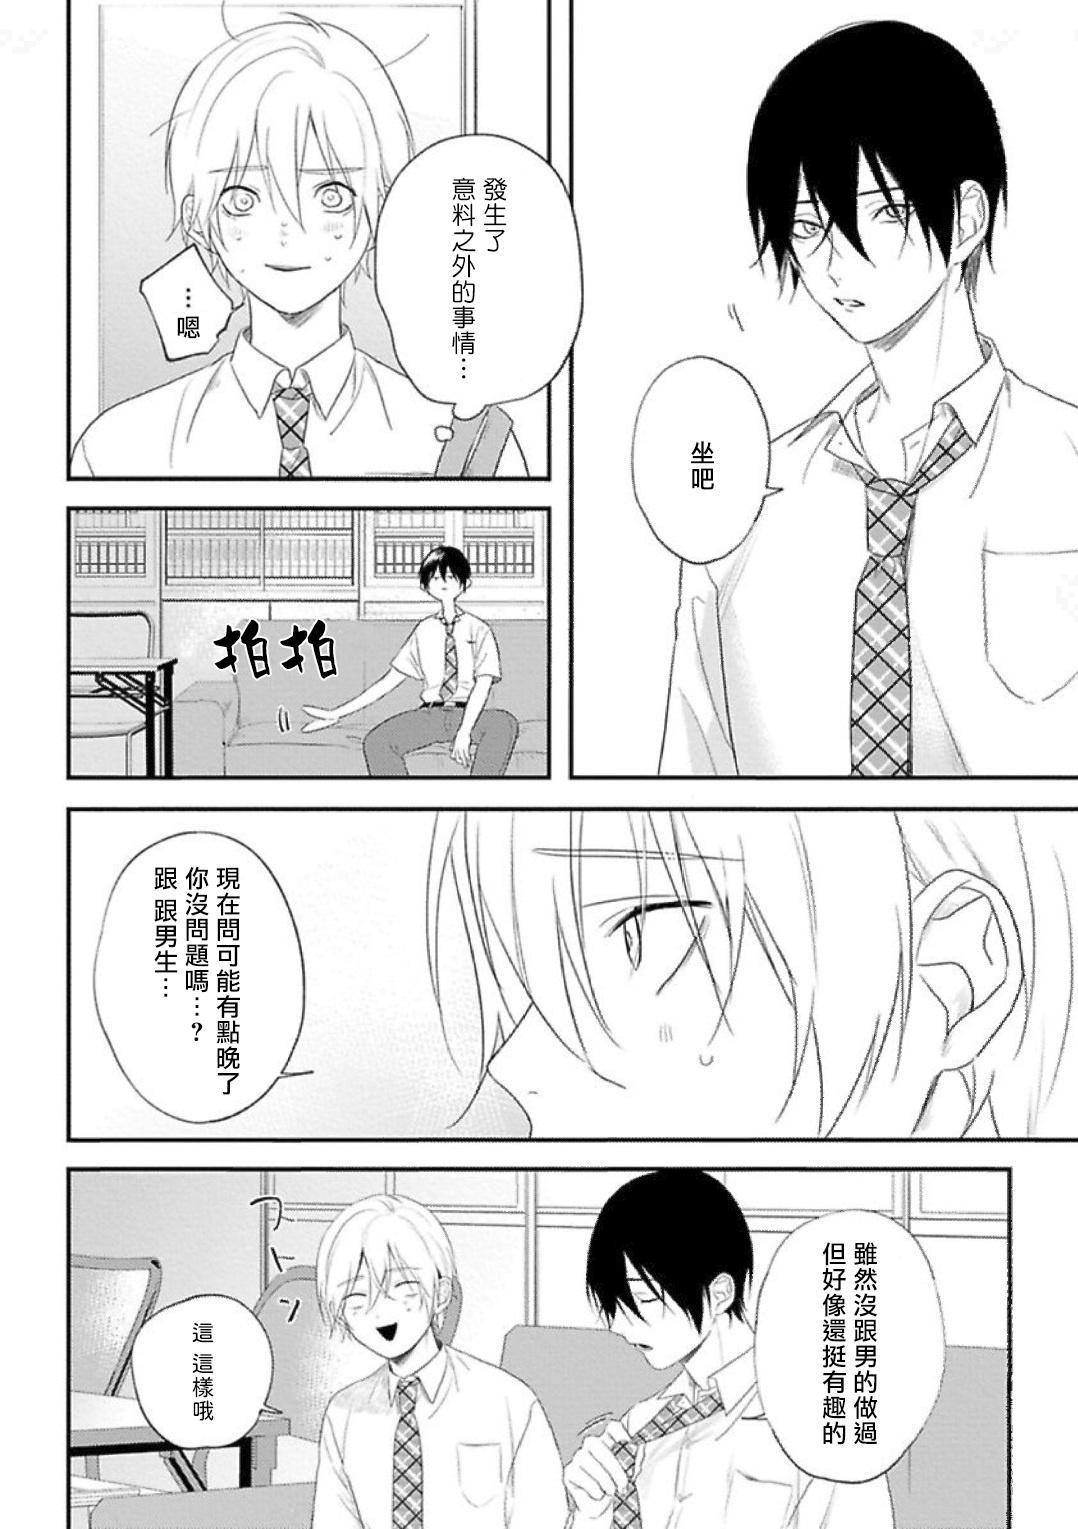 [Utata Hakuto] Houkago Virginity - Virginity afterschool 1-3 [Chinese] [拾荒者汉化组] [Digital] 21